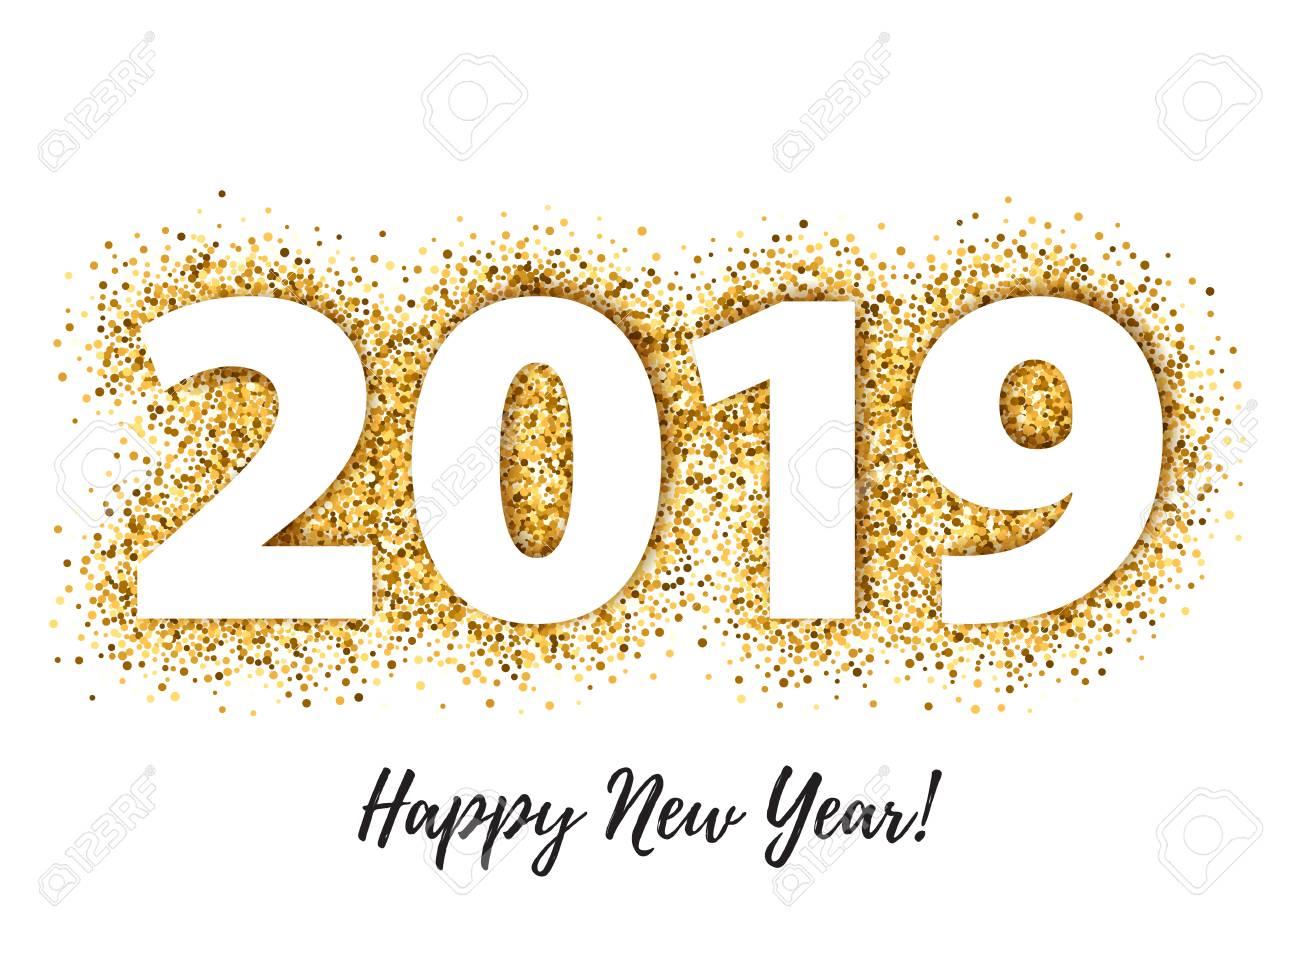 2019 Happy New Year background. Seasonal greeting card template. - 103049134